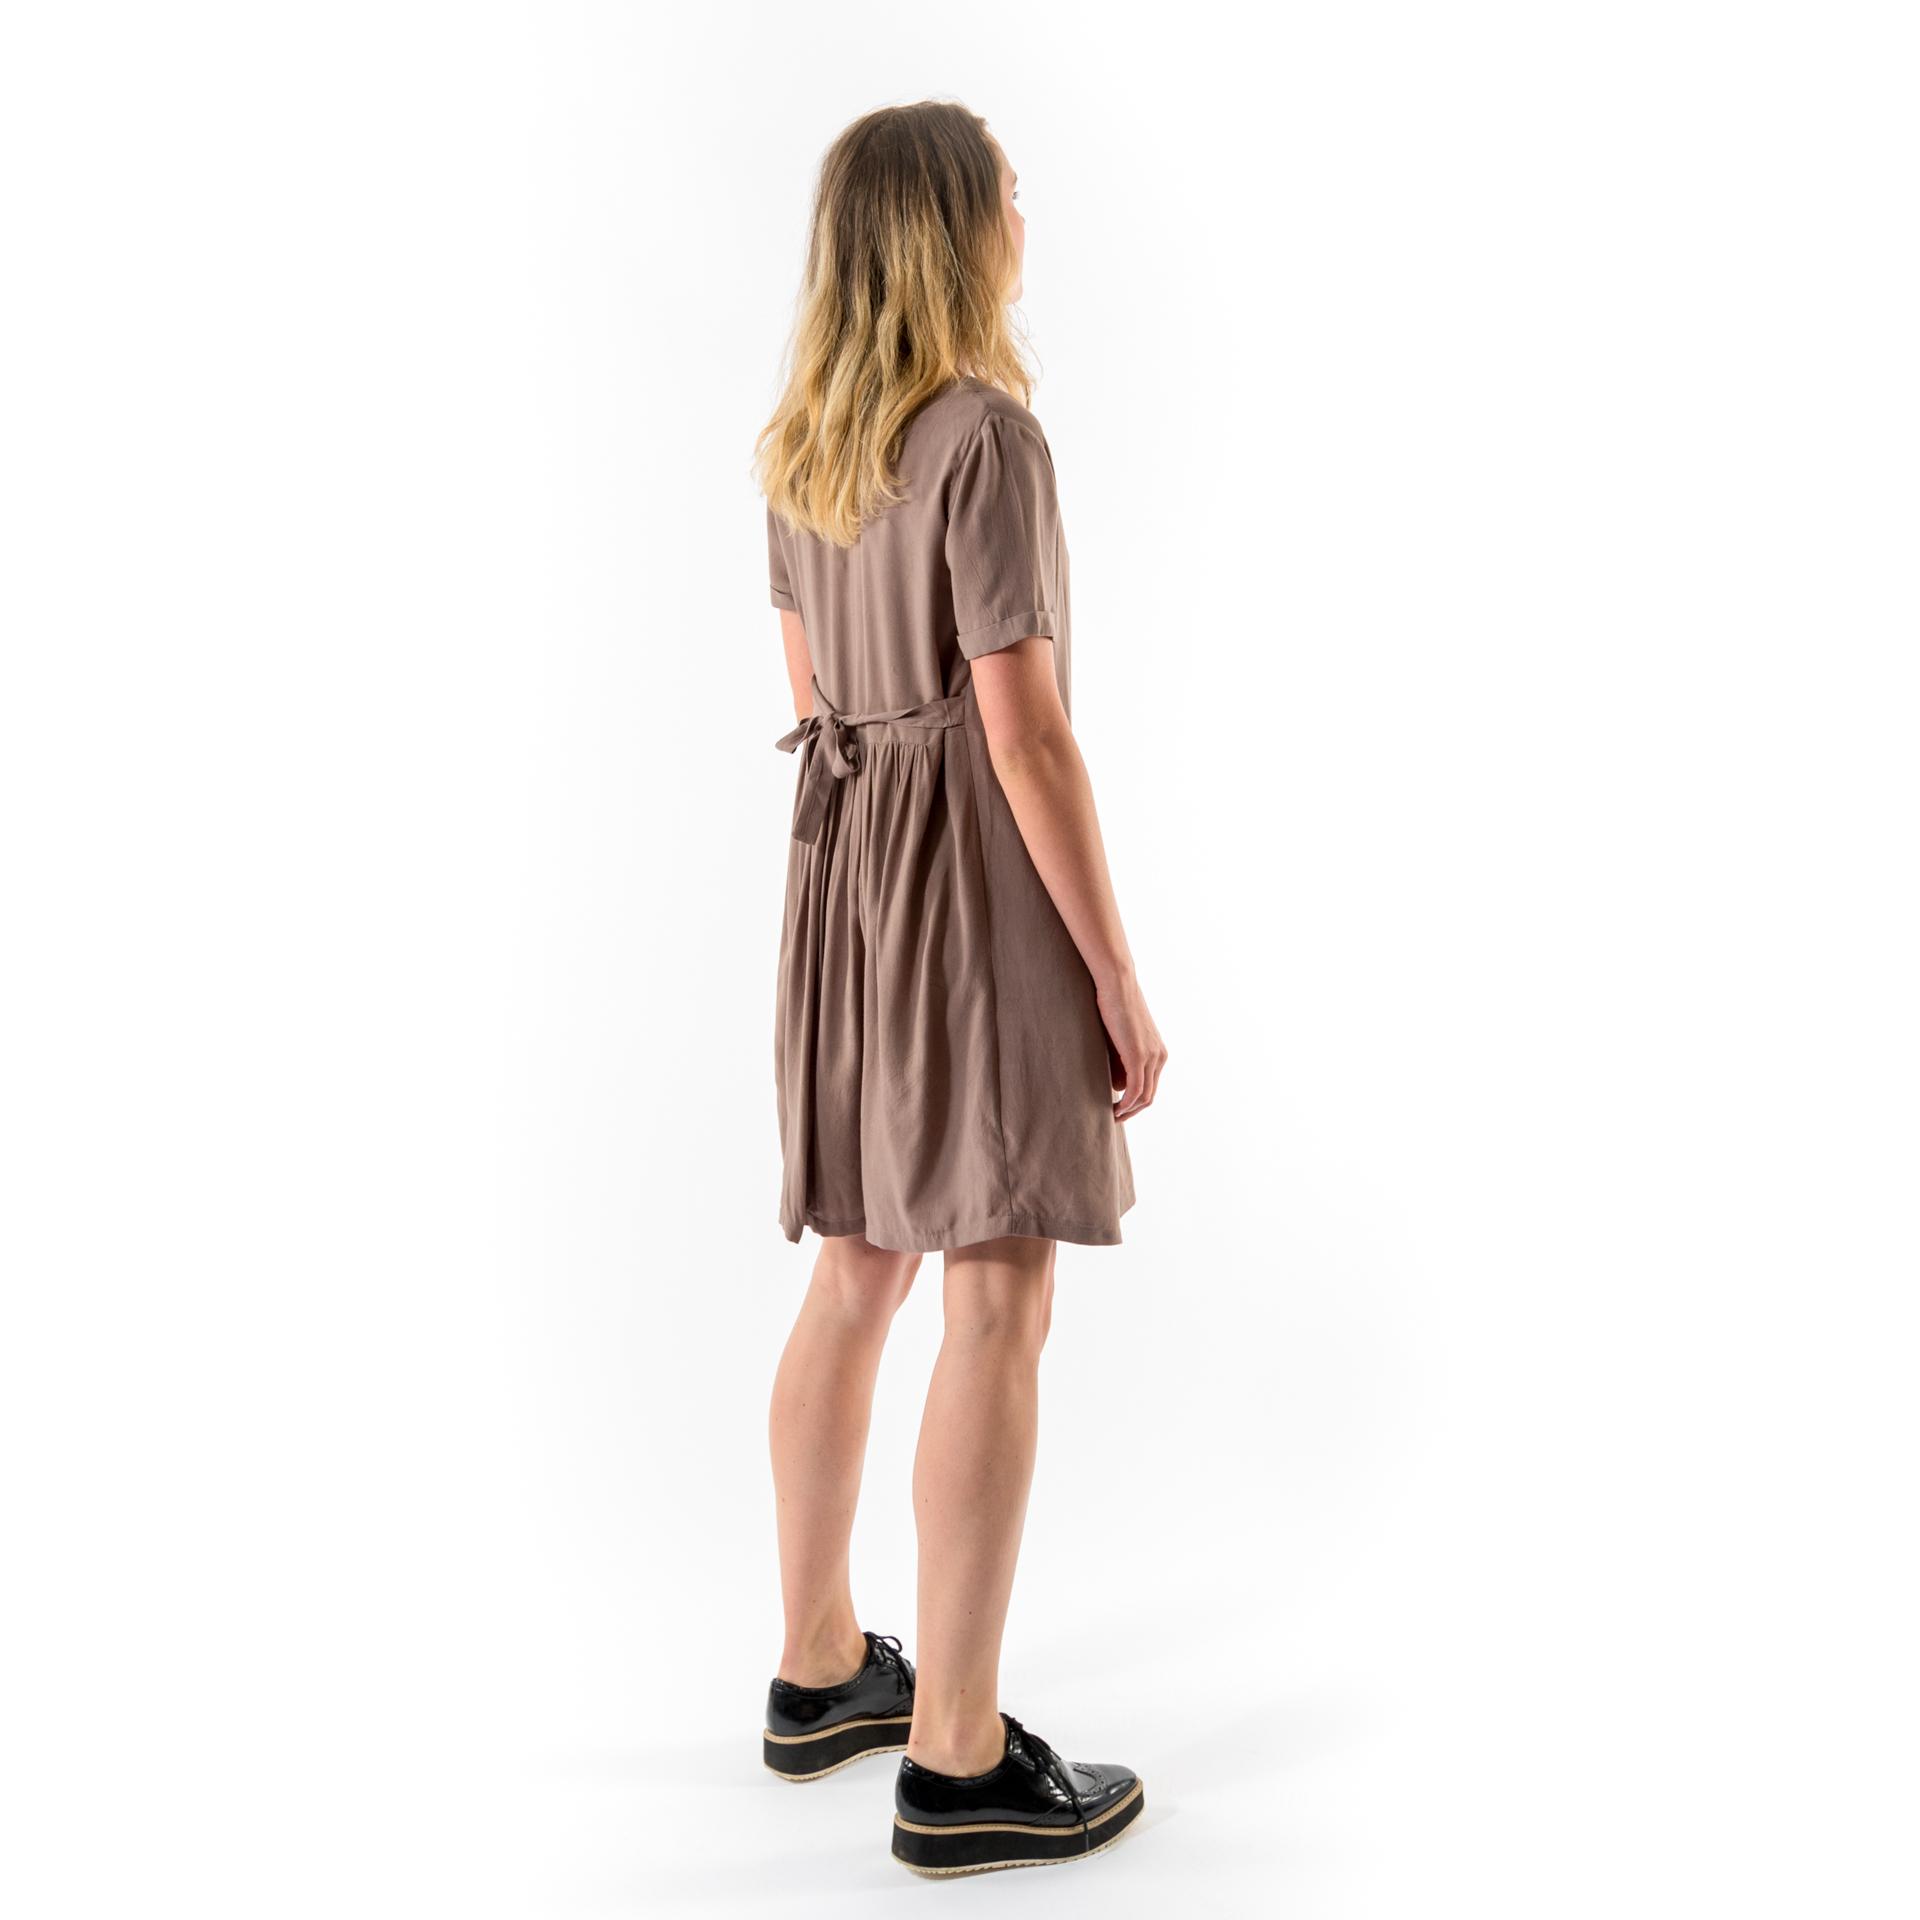 6c78e8dbd6 Kim Sassen Clothing Farm Girl Dress White Front Full. Previous  Next